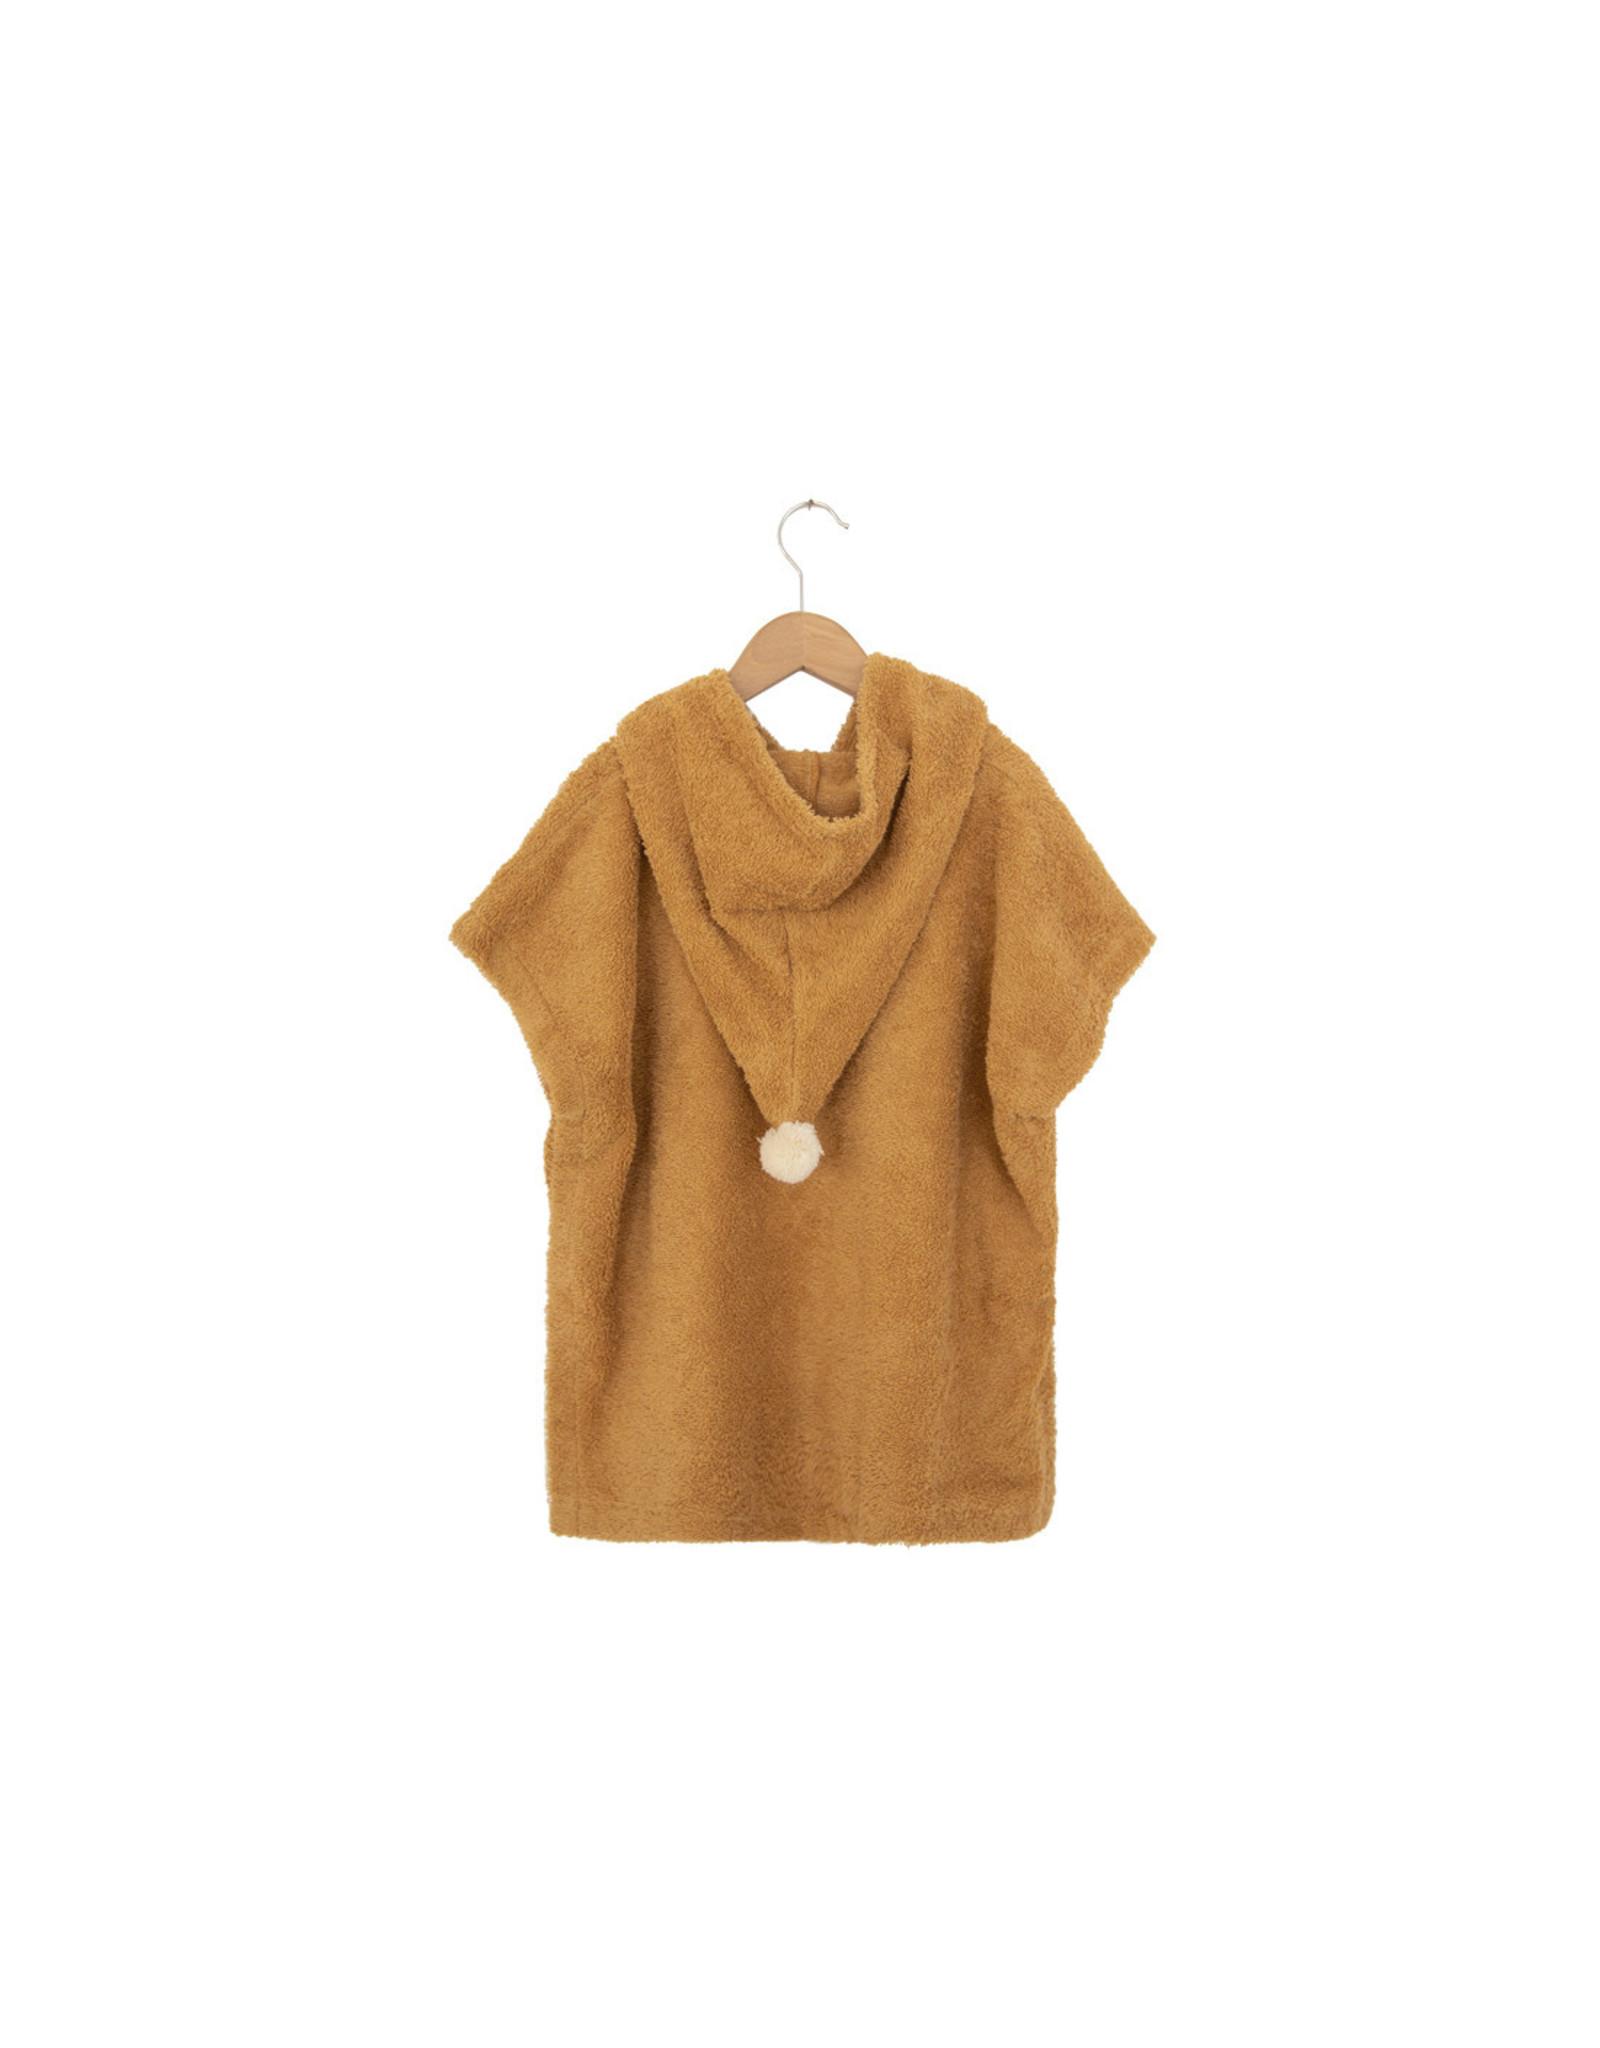 nobodinoz Poncho  - So Cute - Caramel